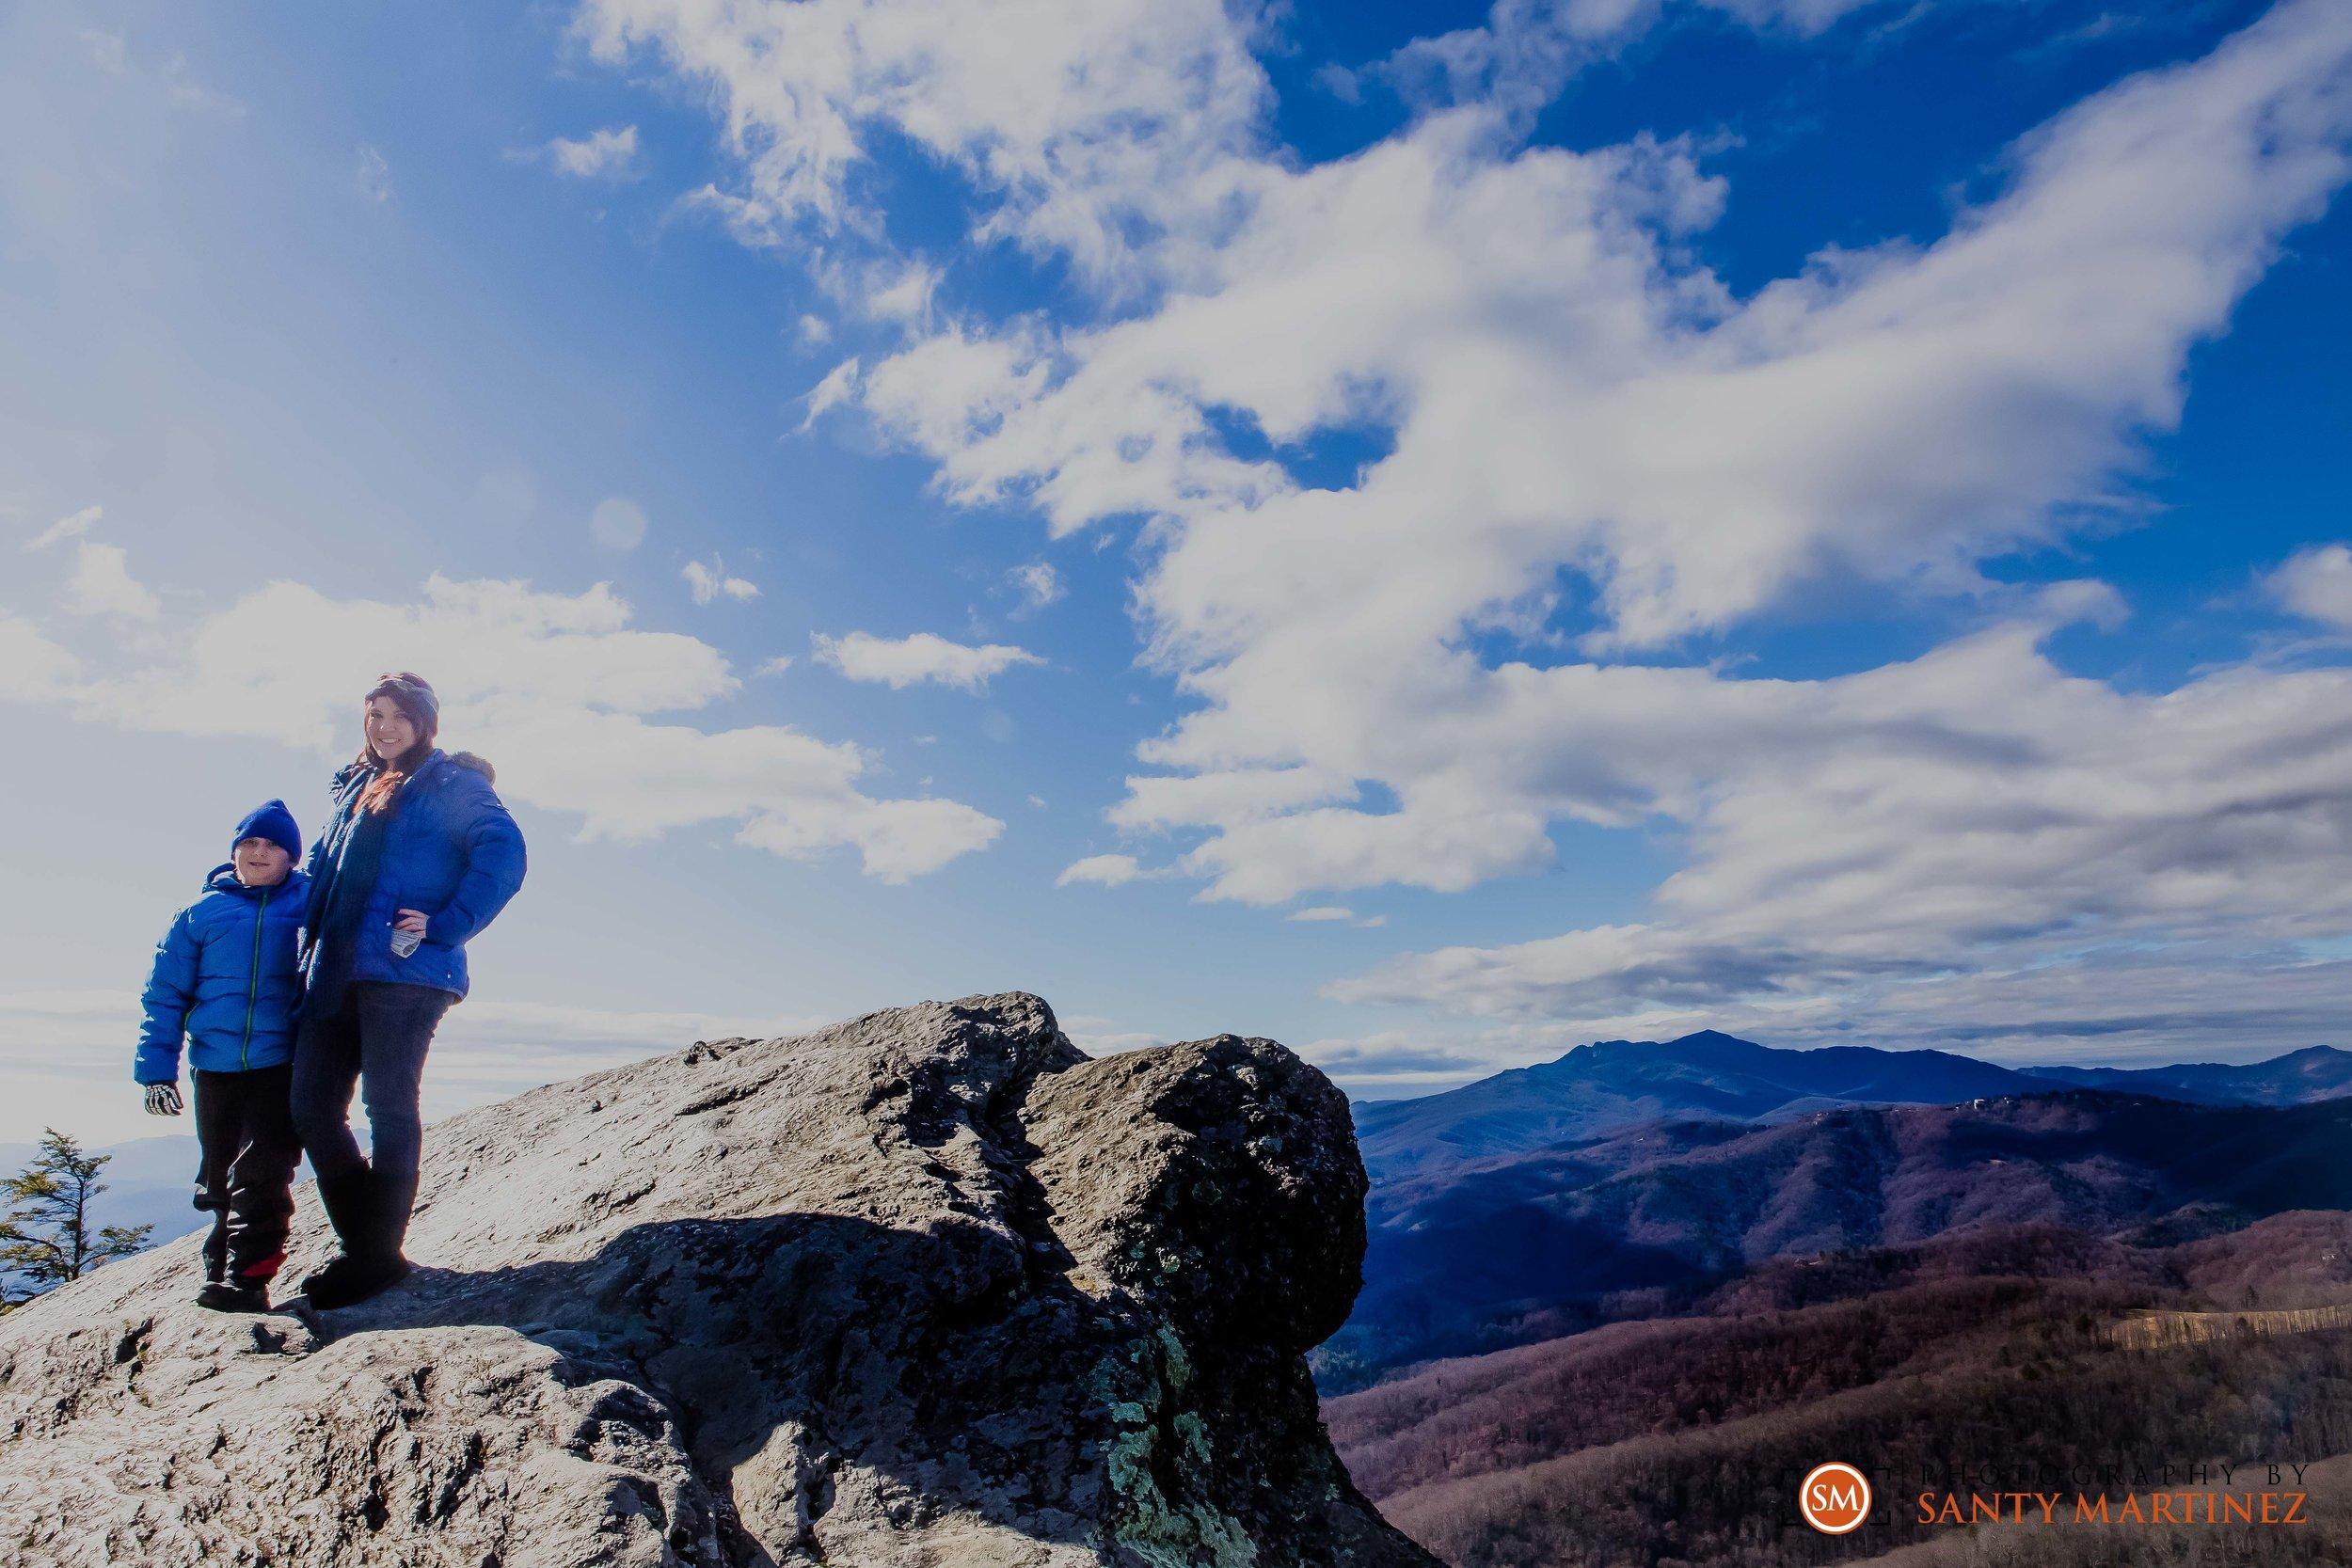 Winter Trip 2014 - Photography by Santy Martinez-30.jpg